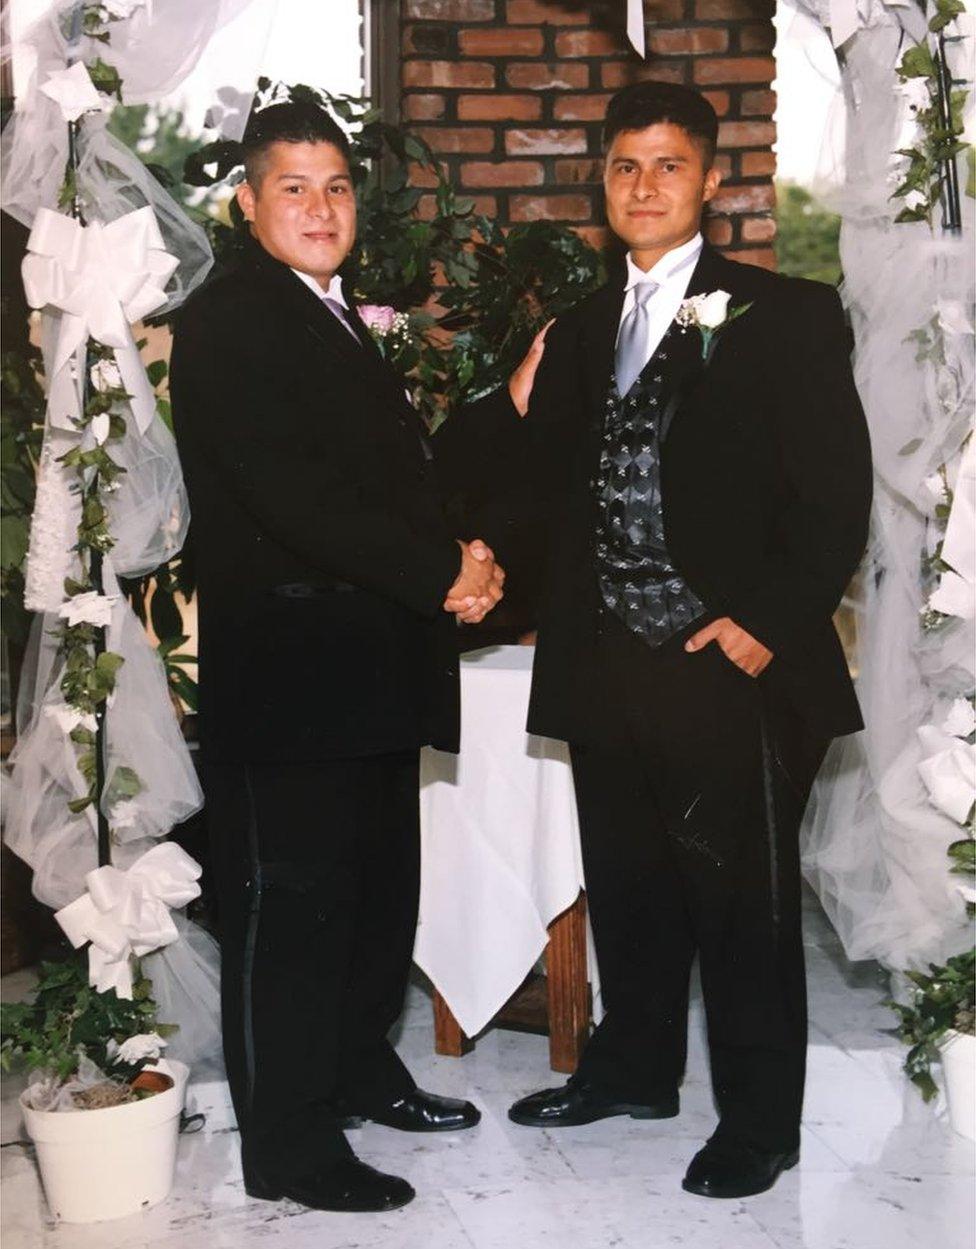 Edgar and Alcides Moreno